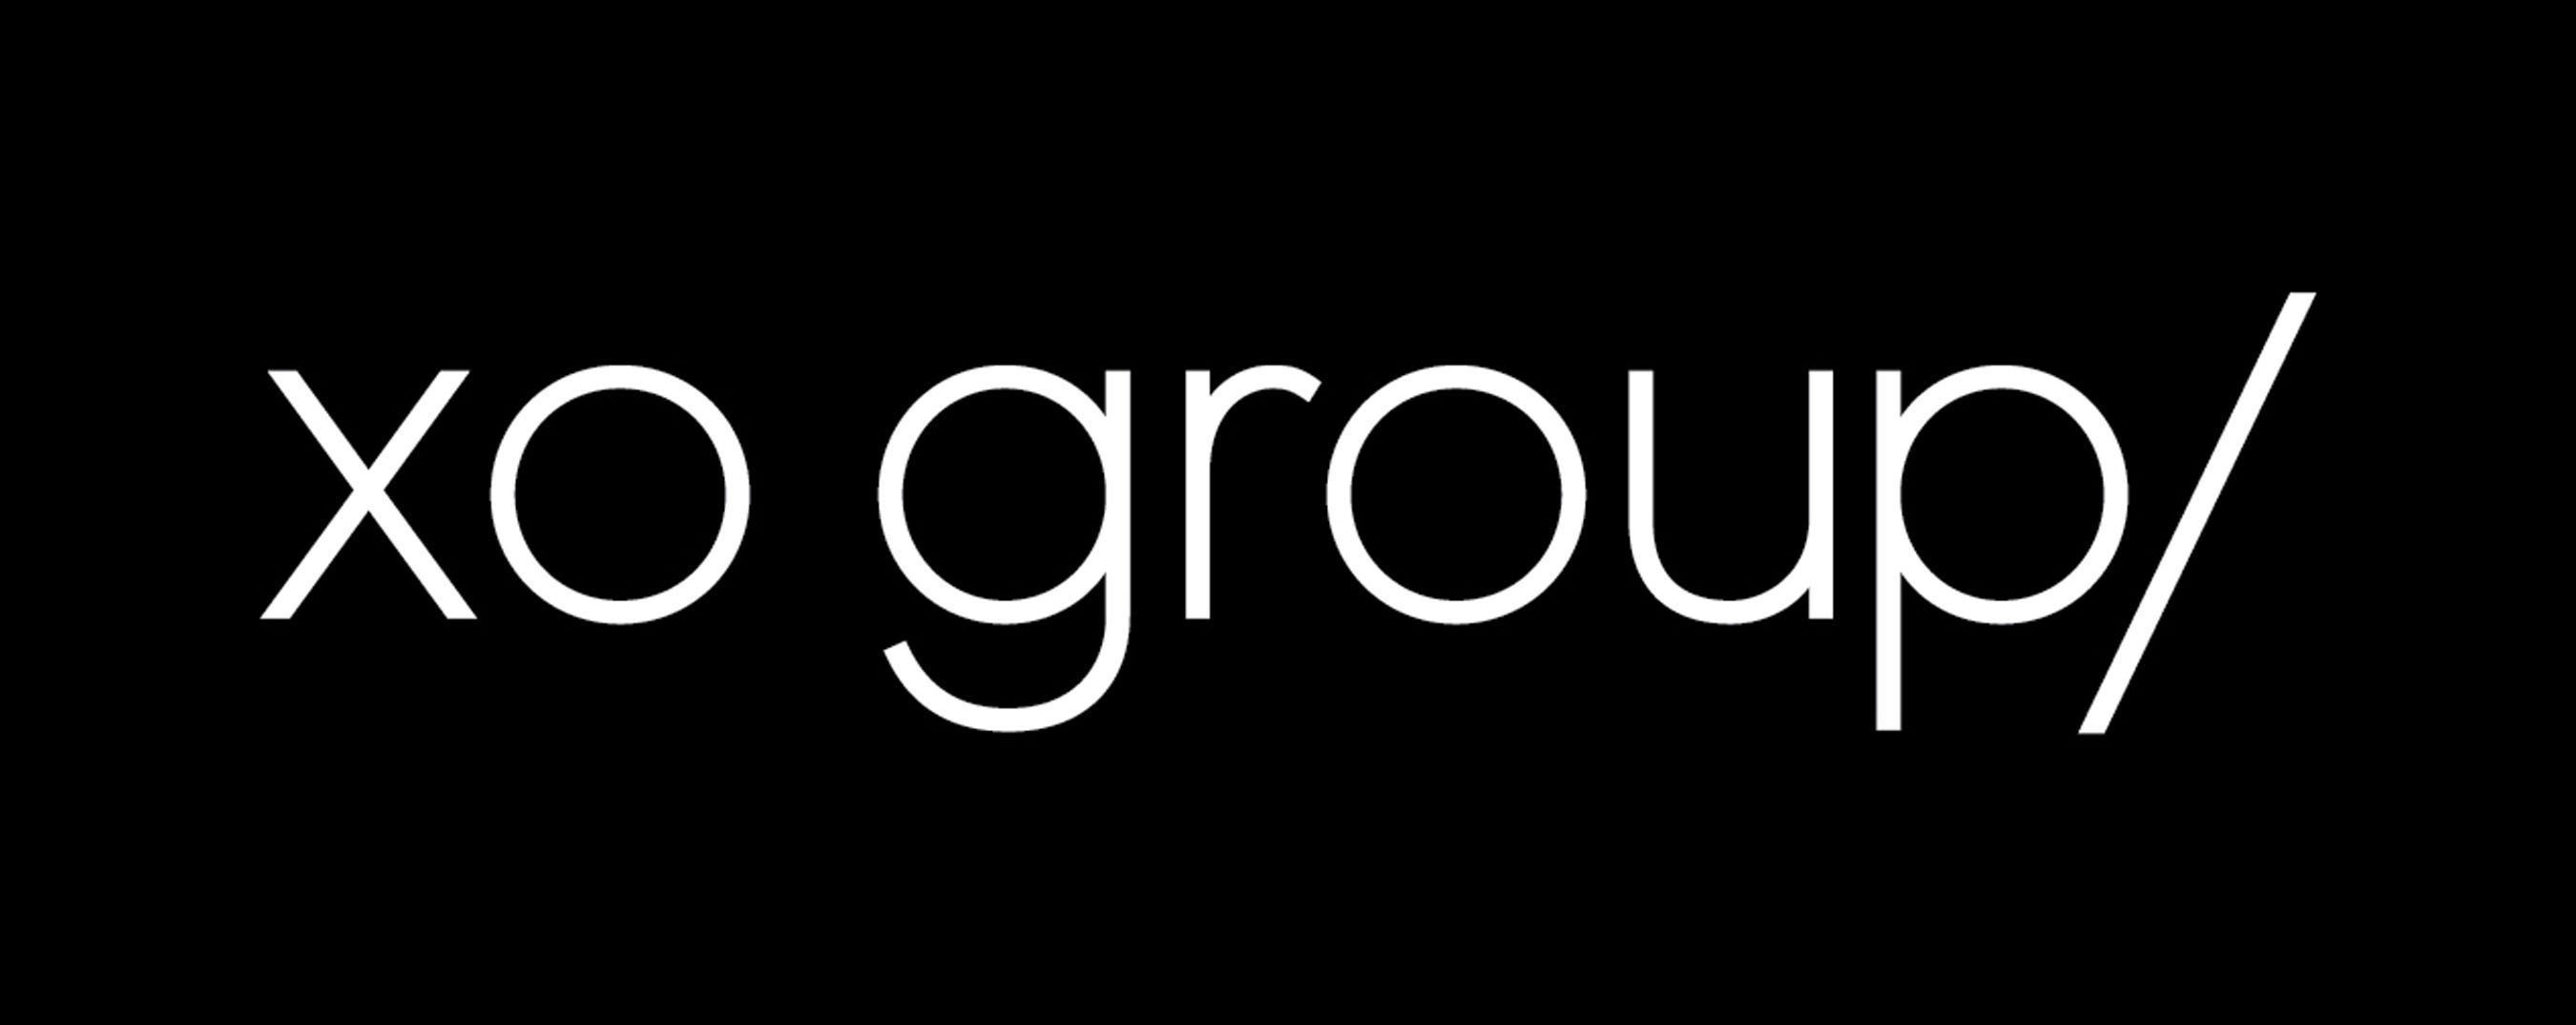 XO Group Inc. (PRNewsFoto/XO Group Inc.) (PRNewsFoto/XO Group Inc.)